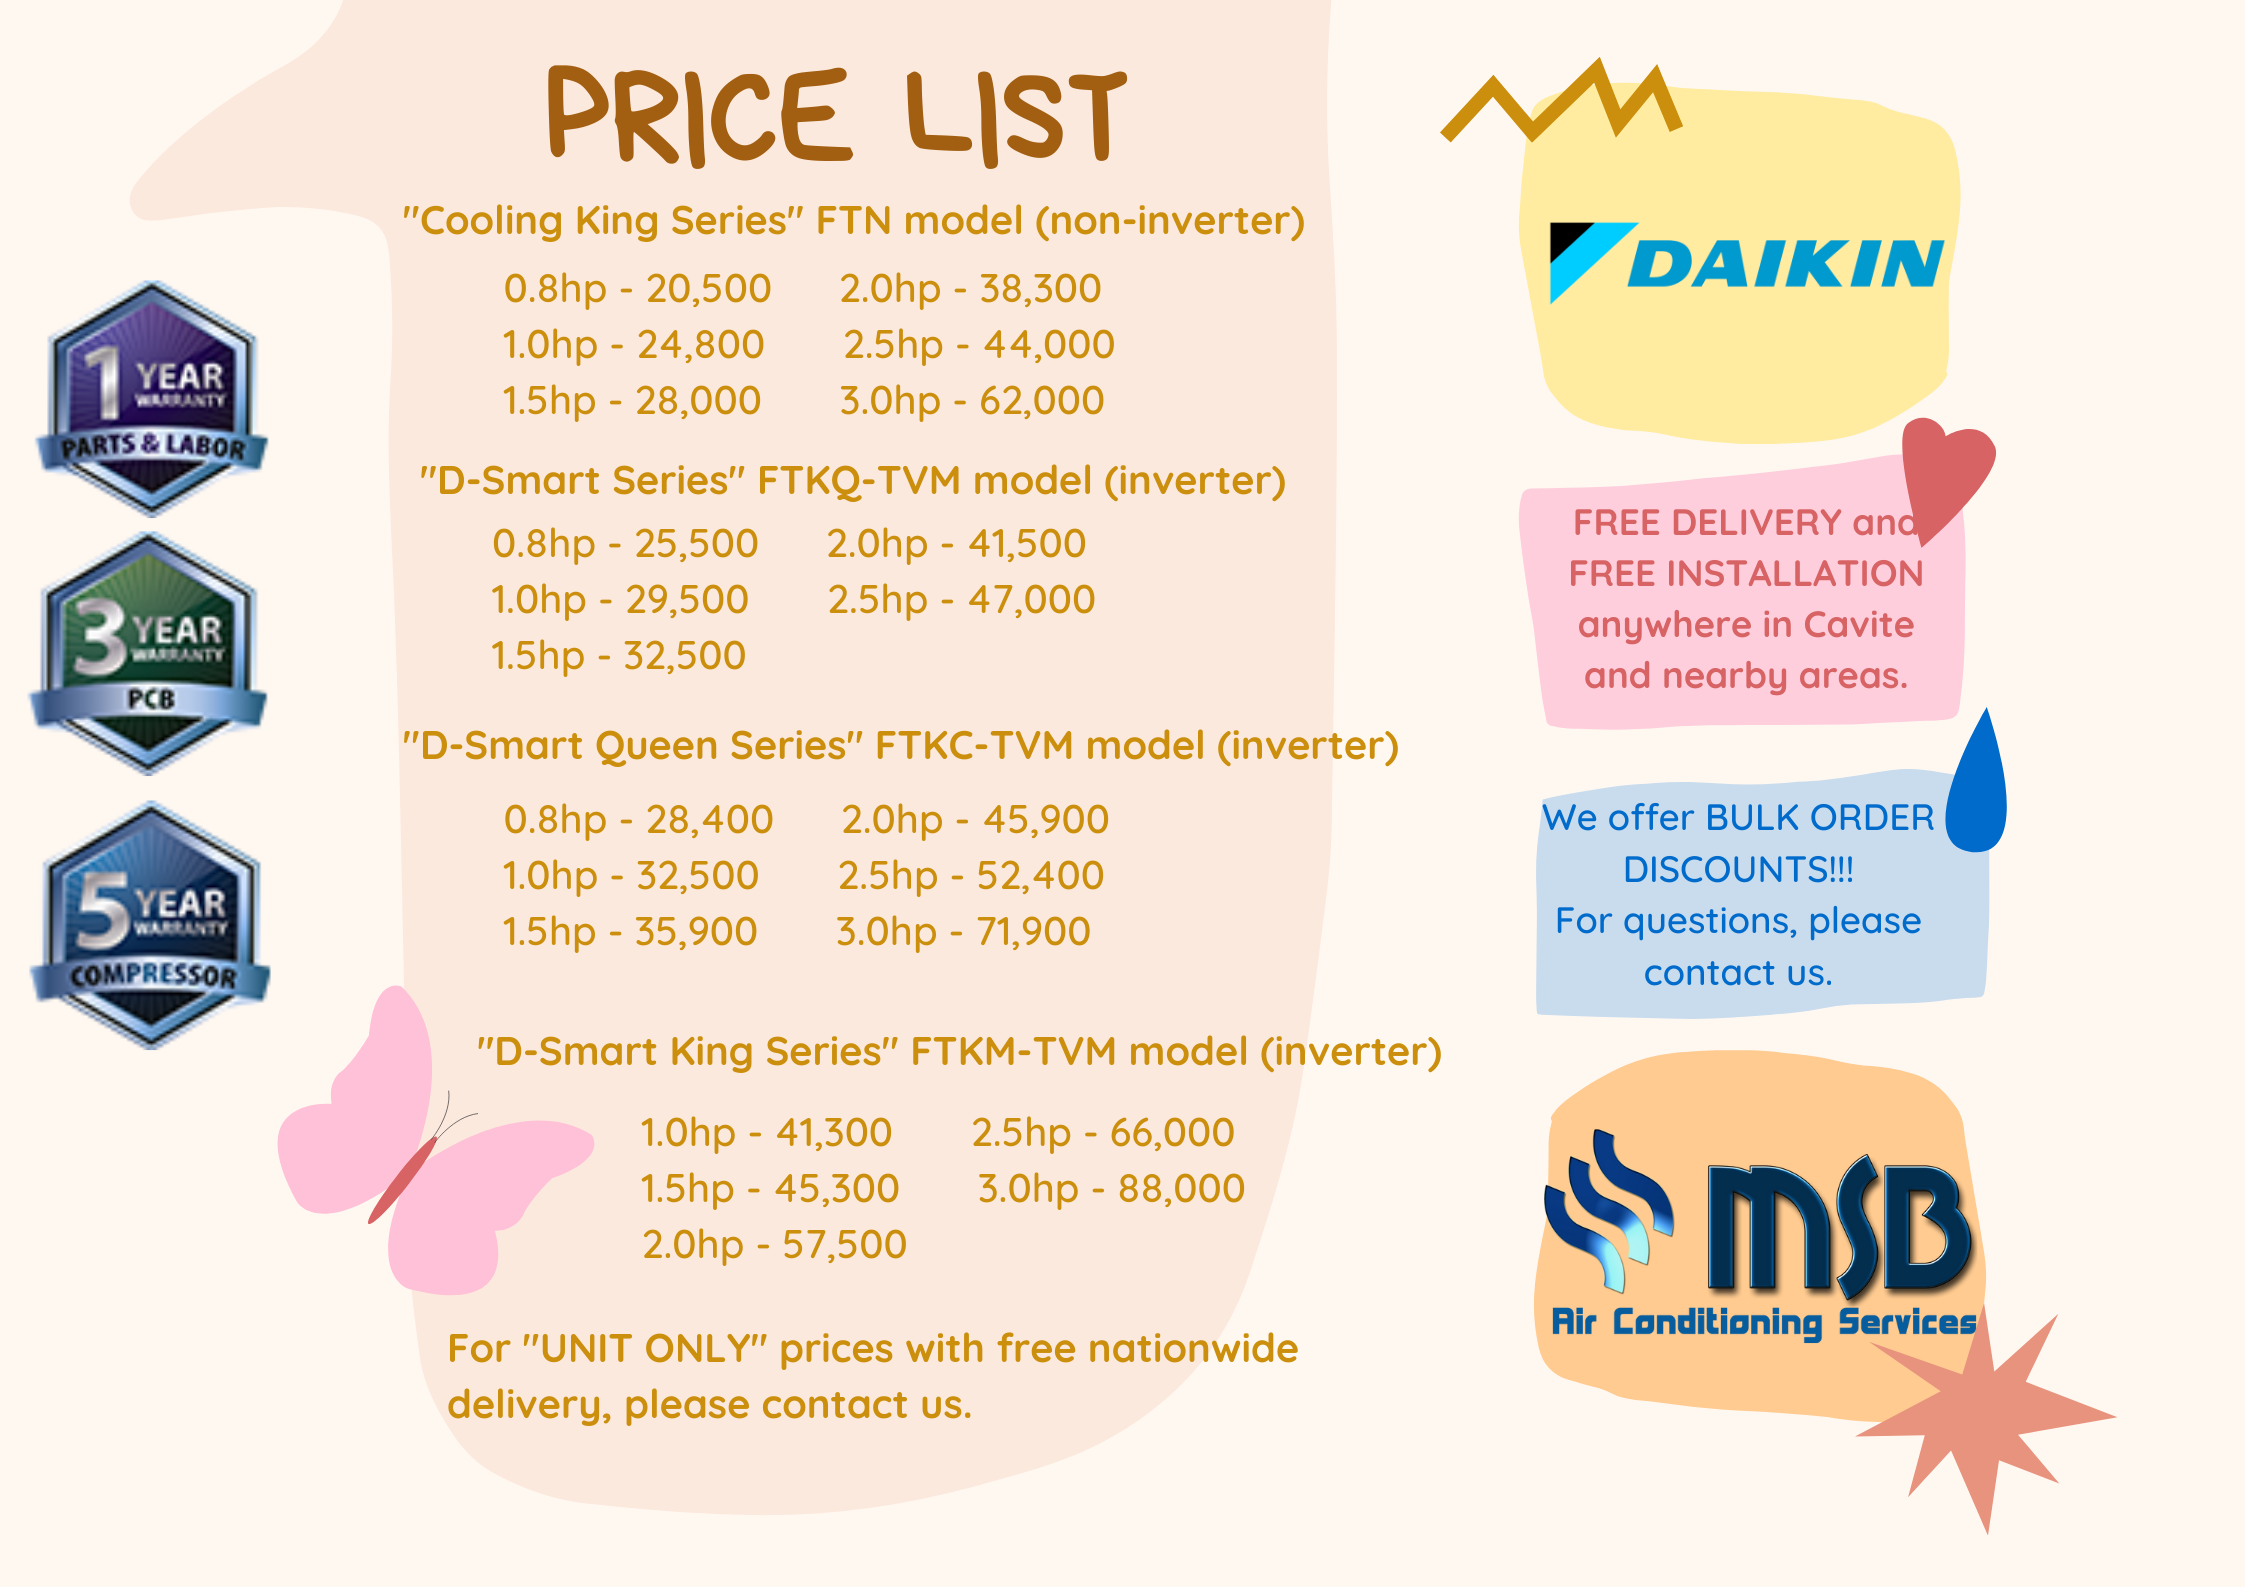 Daikin aircon price list